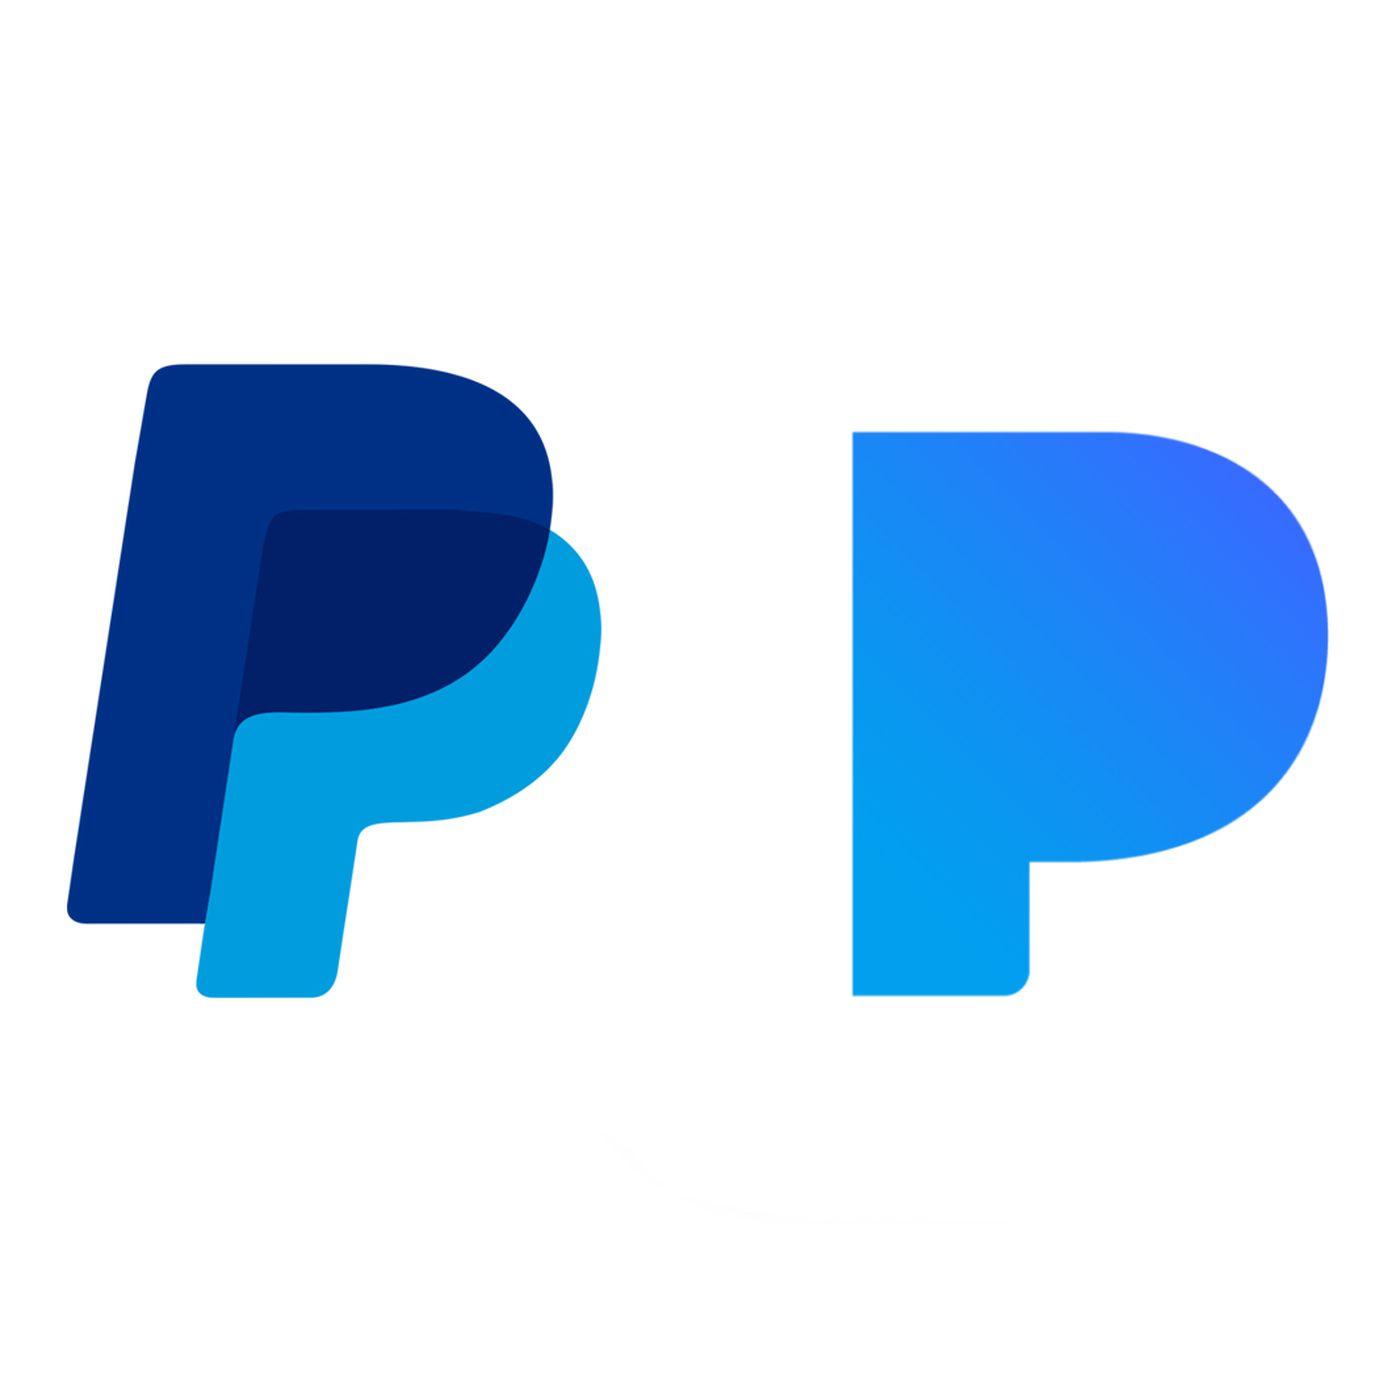 Pandora radio logo clipart picture transparent PayPal burns Pandora to the ground in lawsuit over logo ... picture transparent